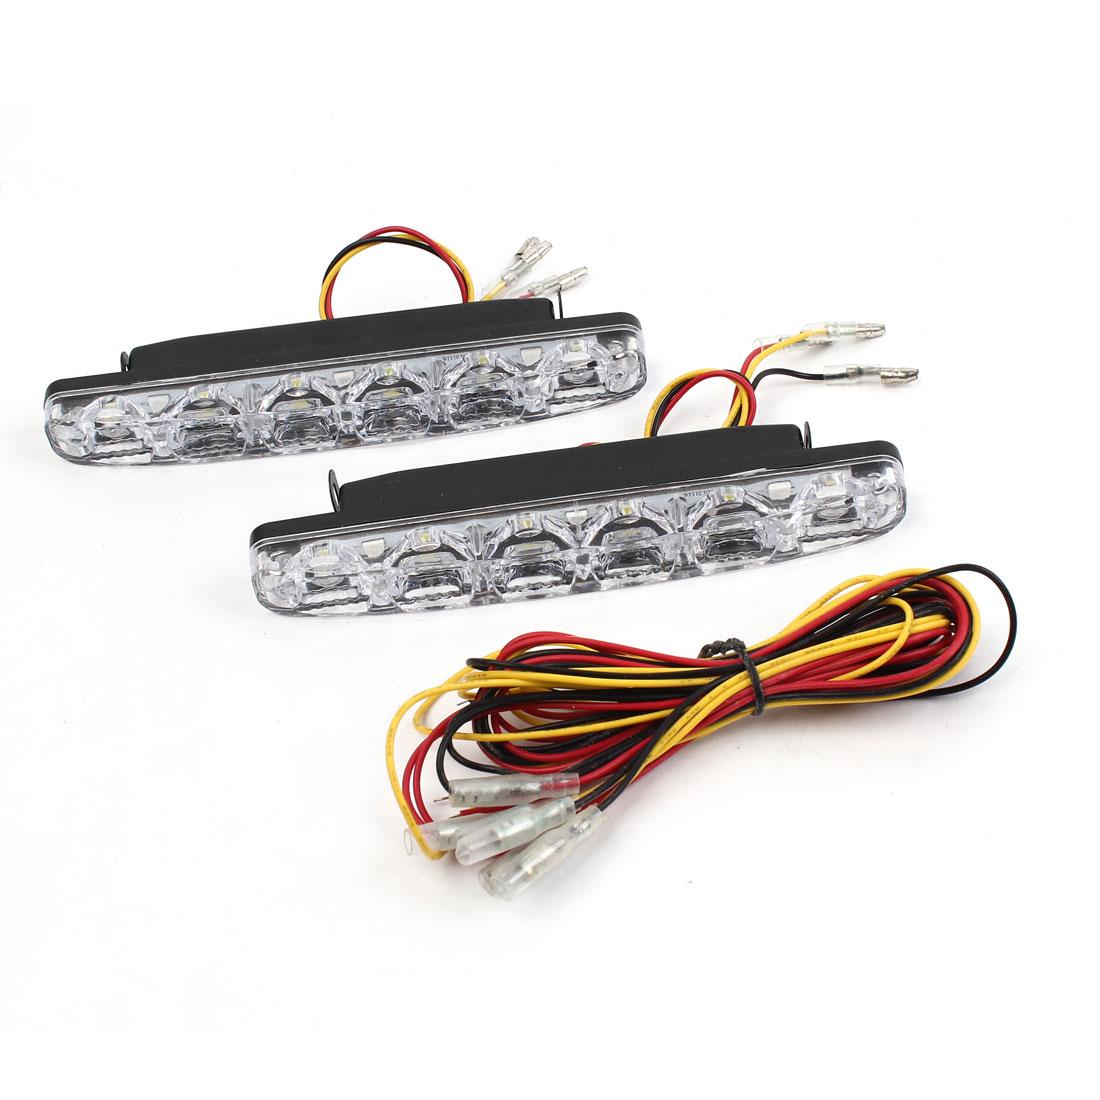 Pair 12V Van White Yellow 6 LED DRL Daytime Running Lamp Light Driving Blub